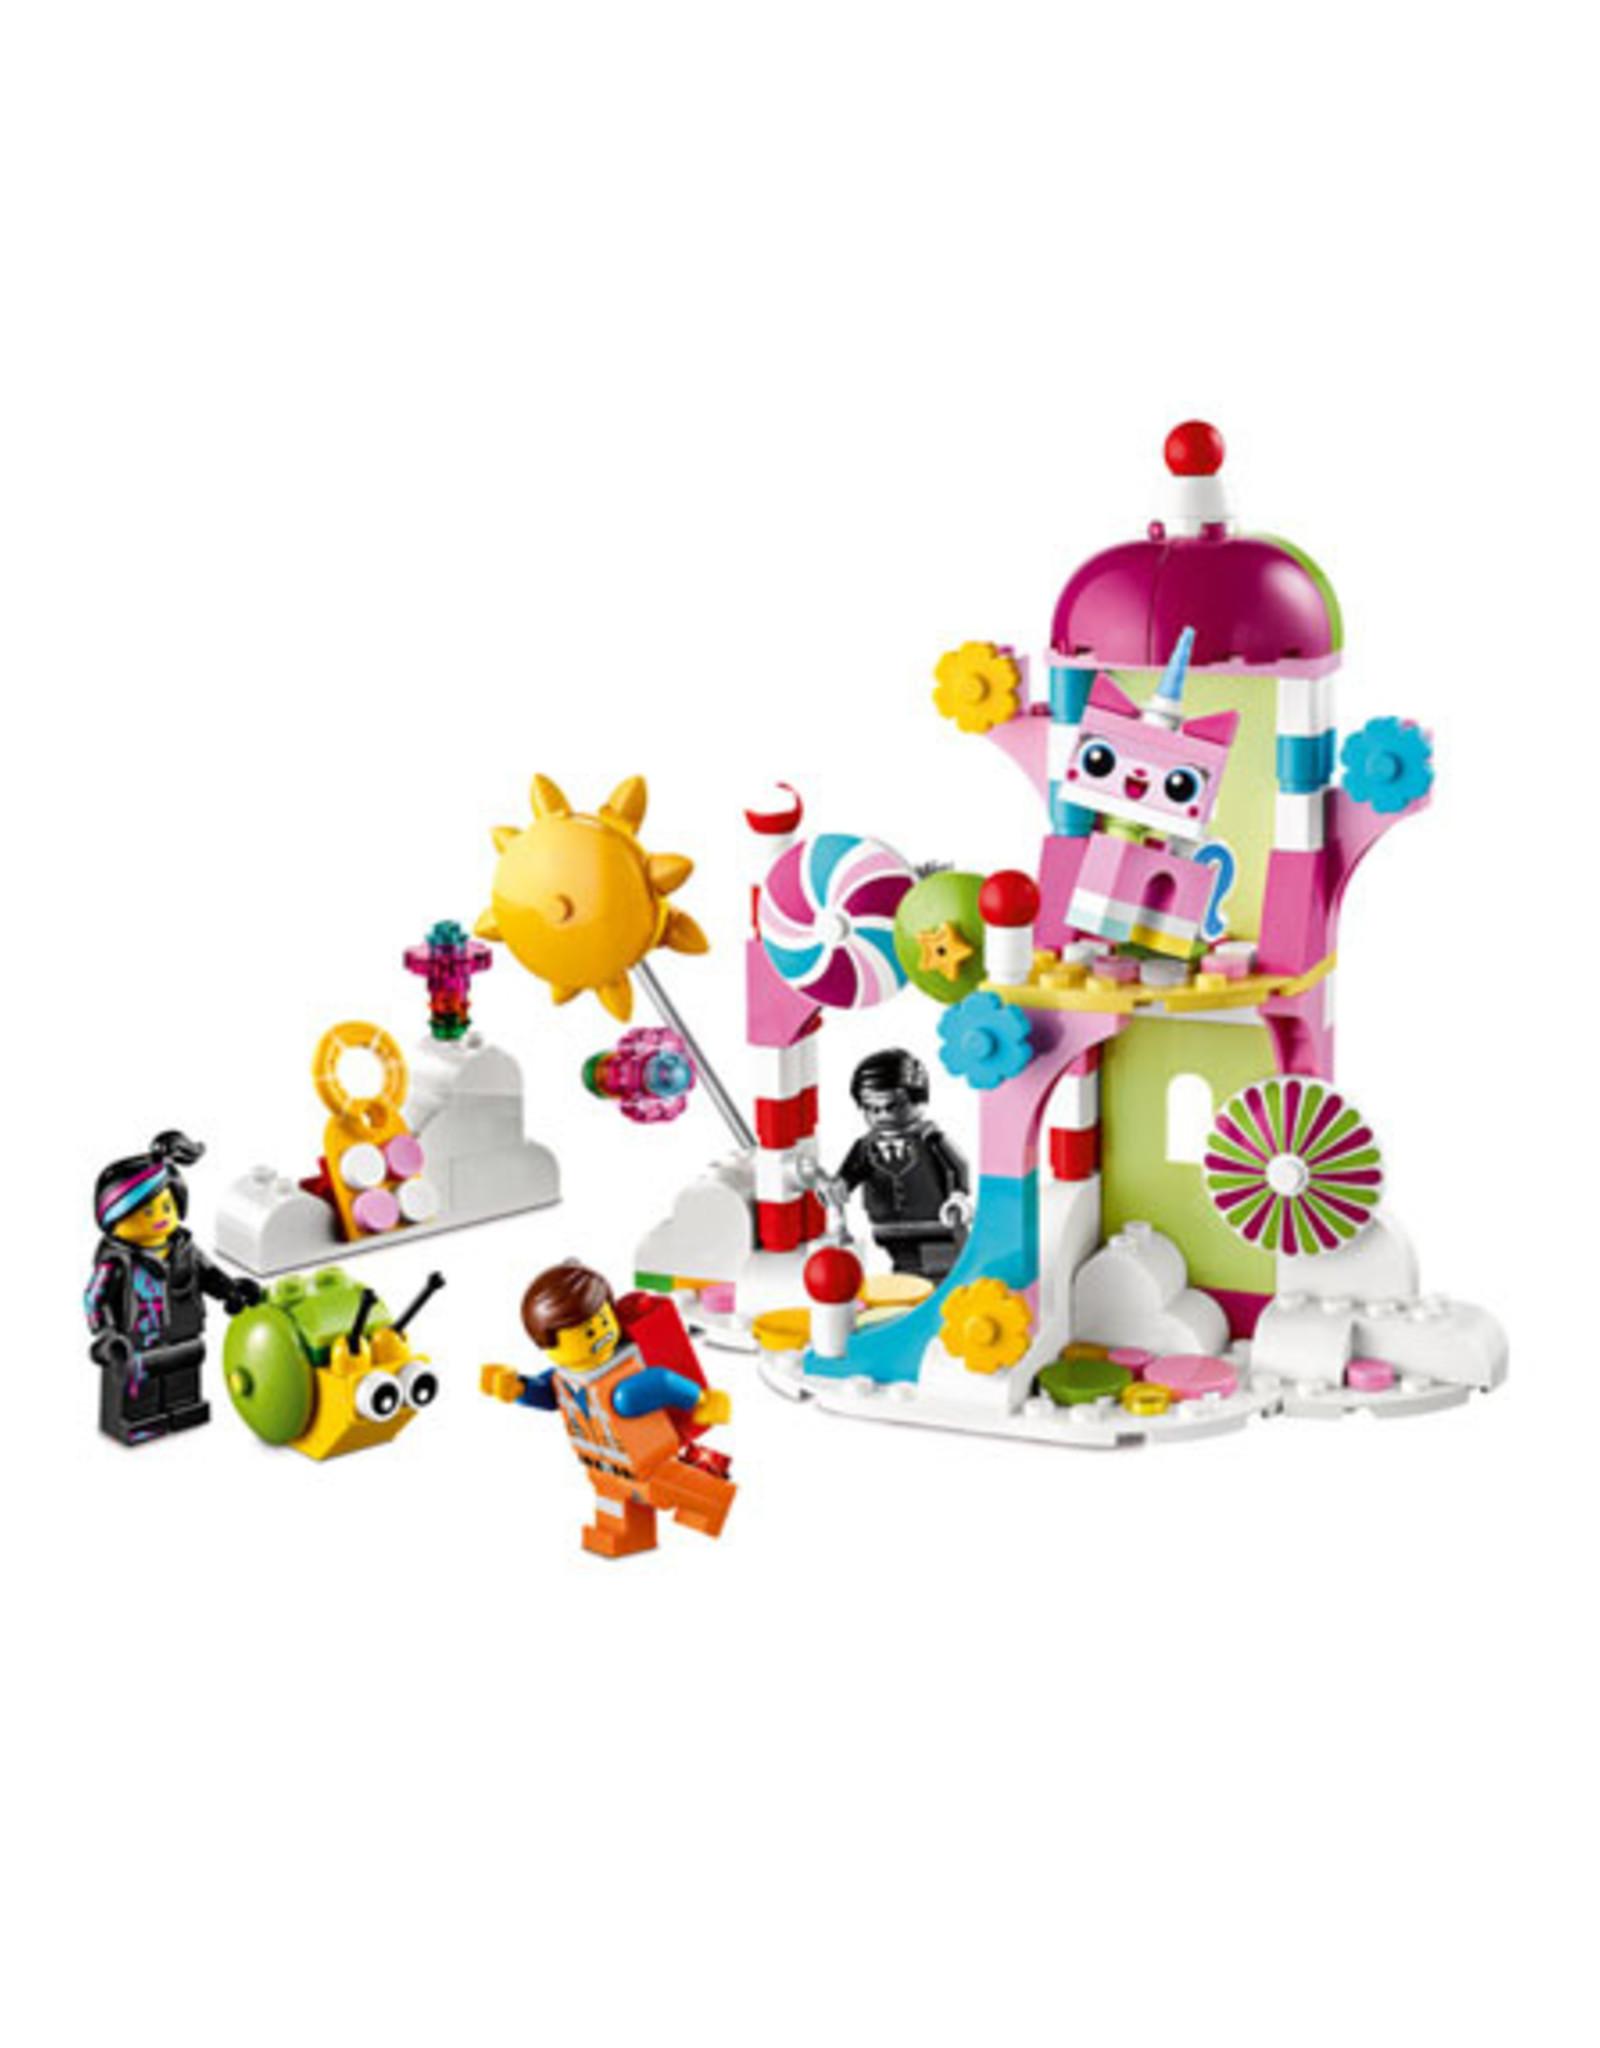 LEGO LEGO 70803 Cloud Cuckoo Palace MOVIE